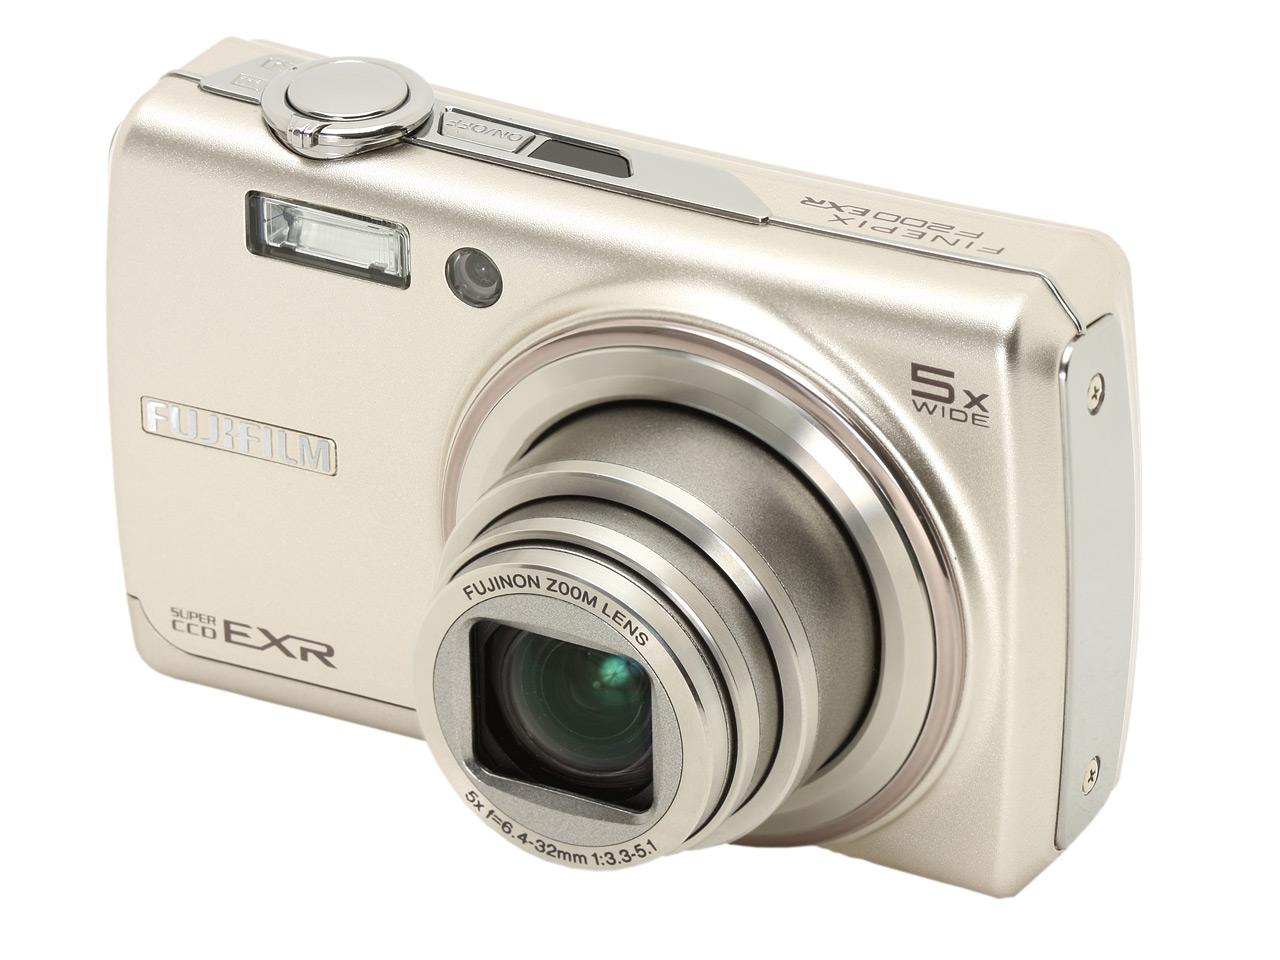 Fujifilm FinePix F200EXR Camera